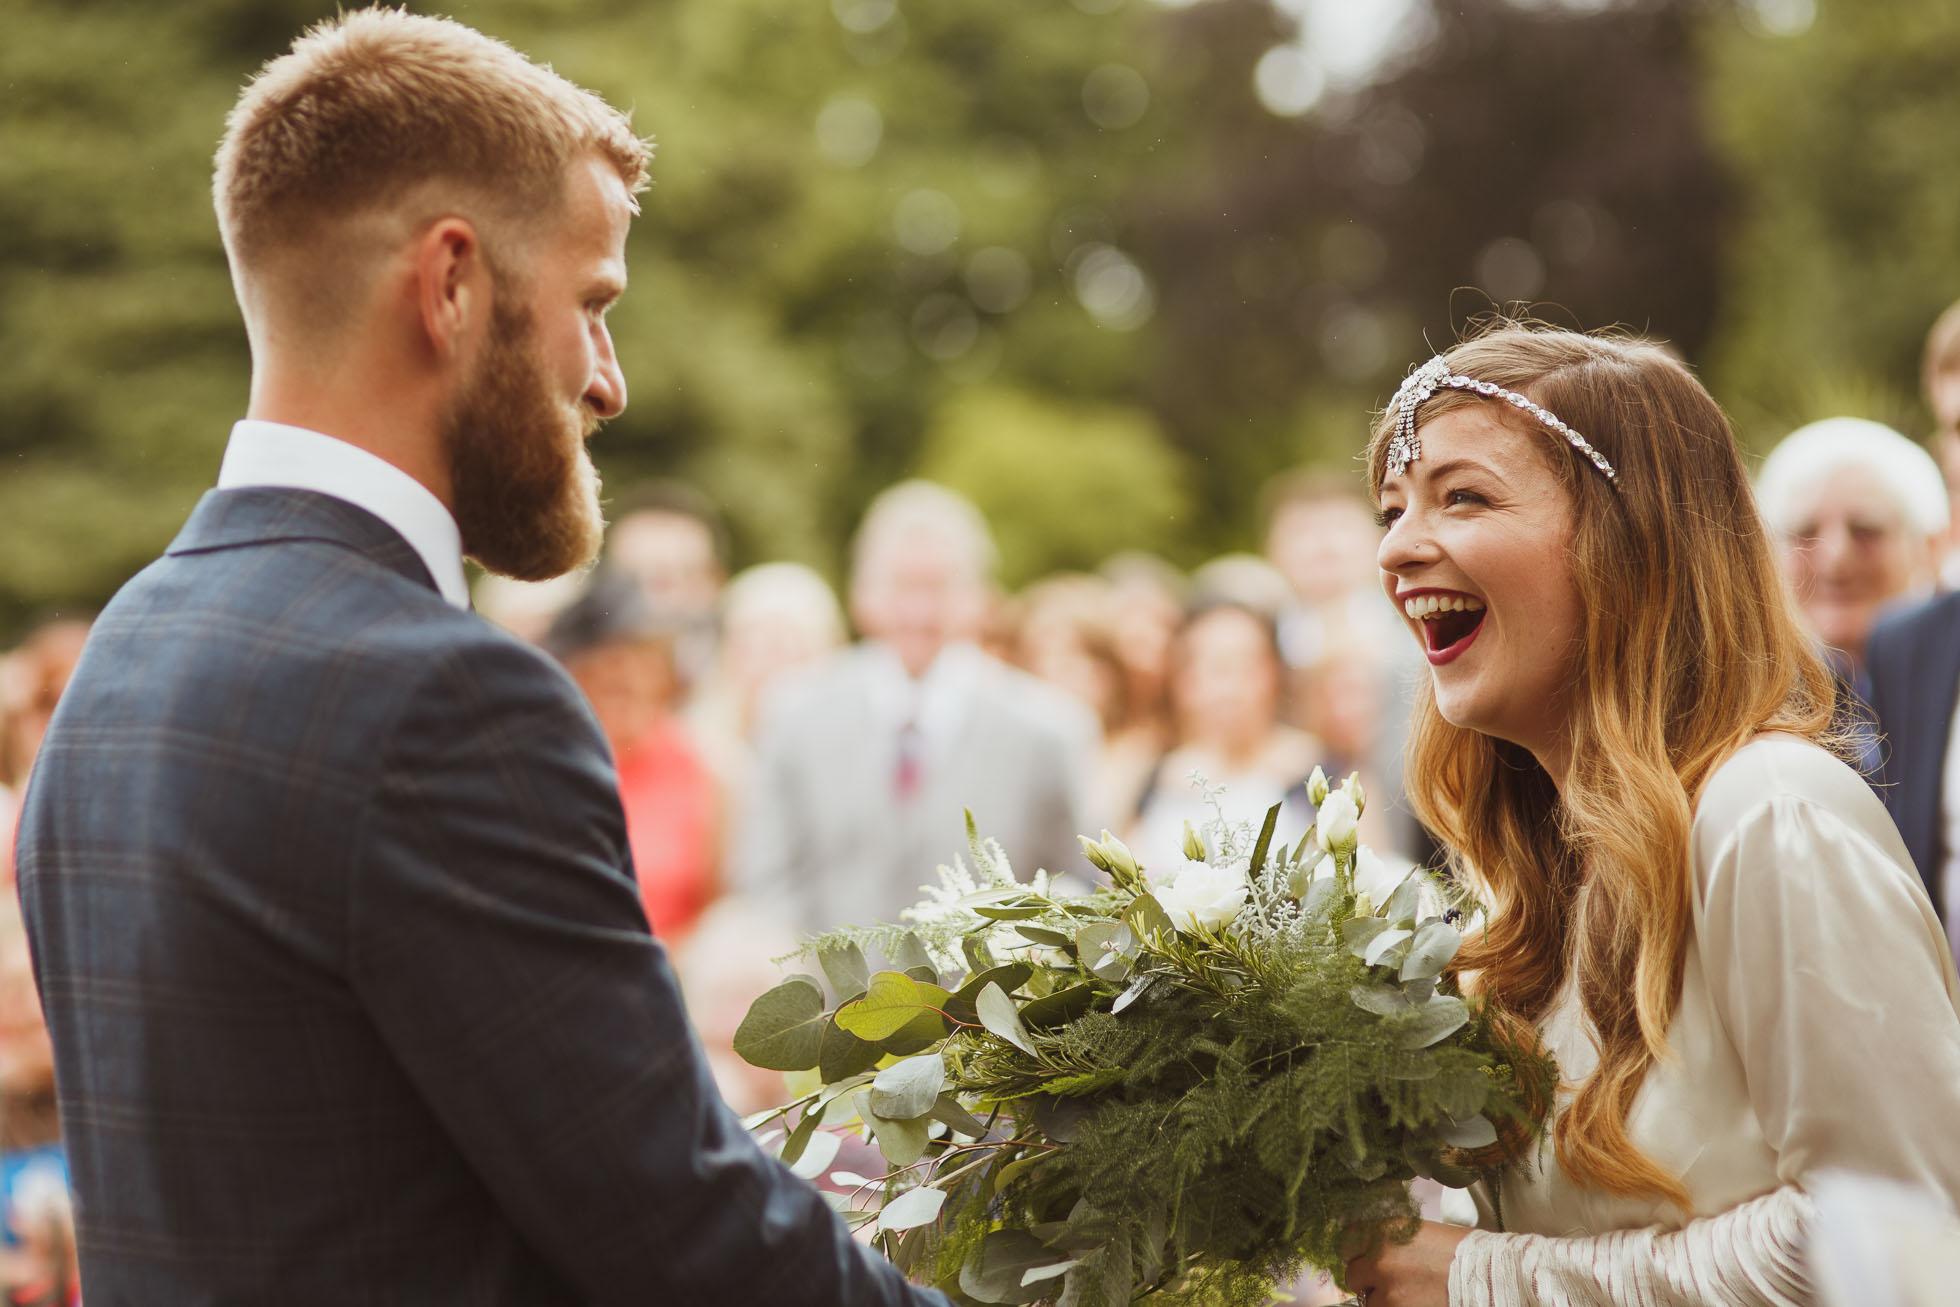 sheffield-botanical-gardens-wedding-photographer-23.jpg